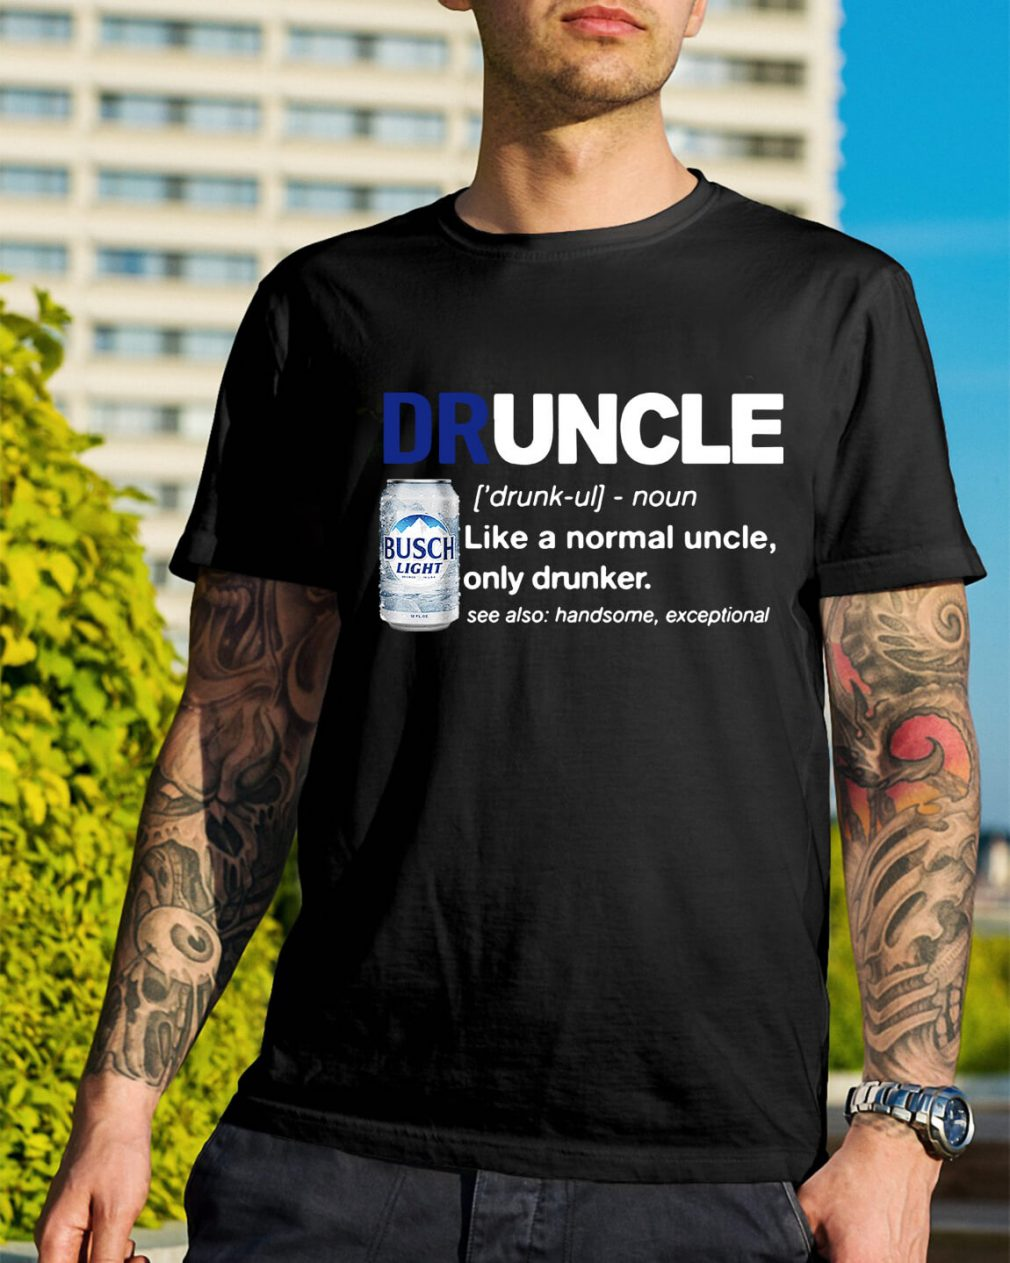 Druncle Busch Light definition like a normal uncle only drunker shirt